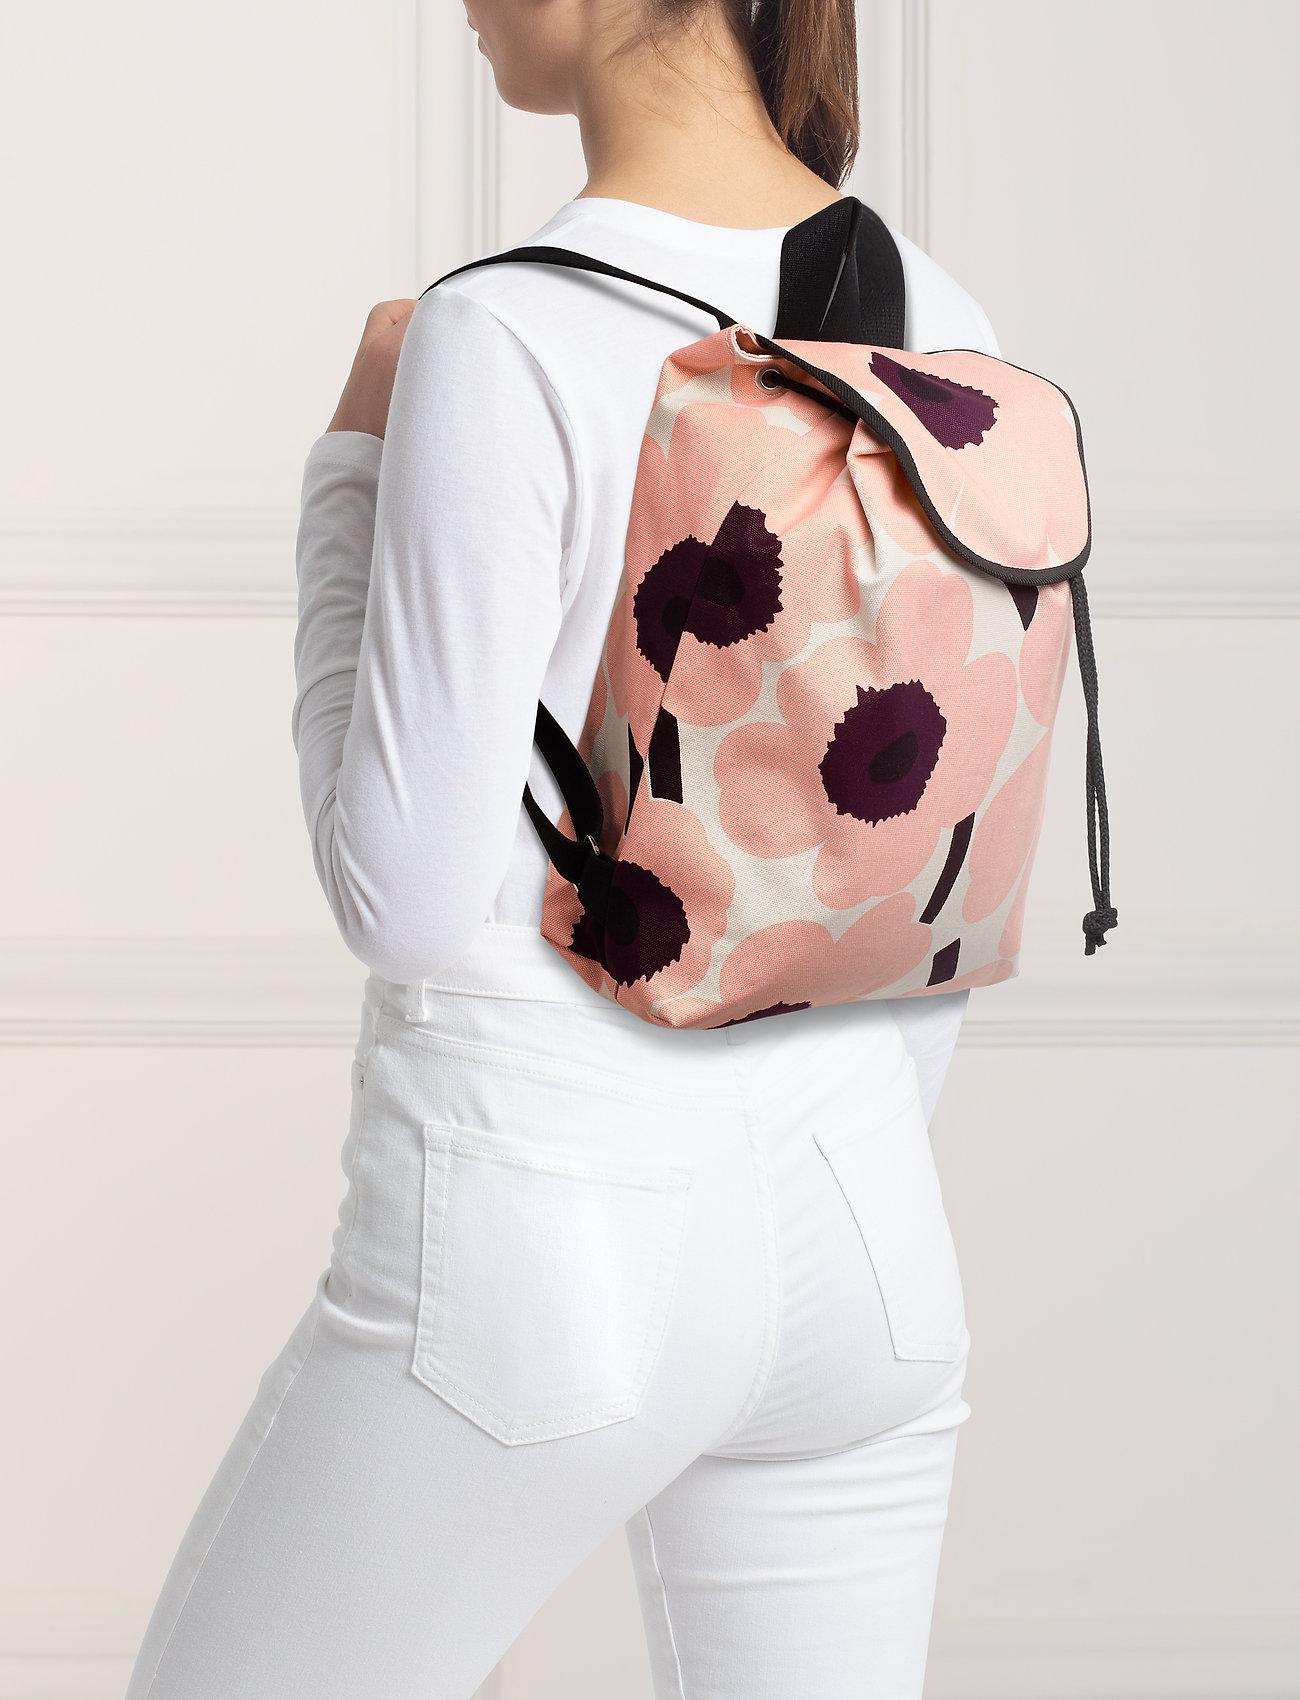 Marimekko ERIKA PIENI UNIKKO Backpack - LIGHT BEIGE,PINK,BURGUNDY